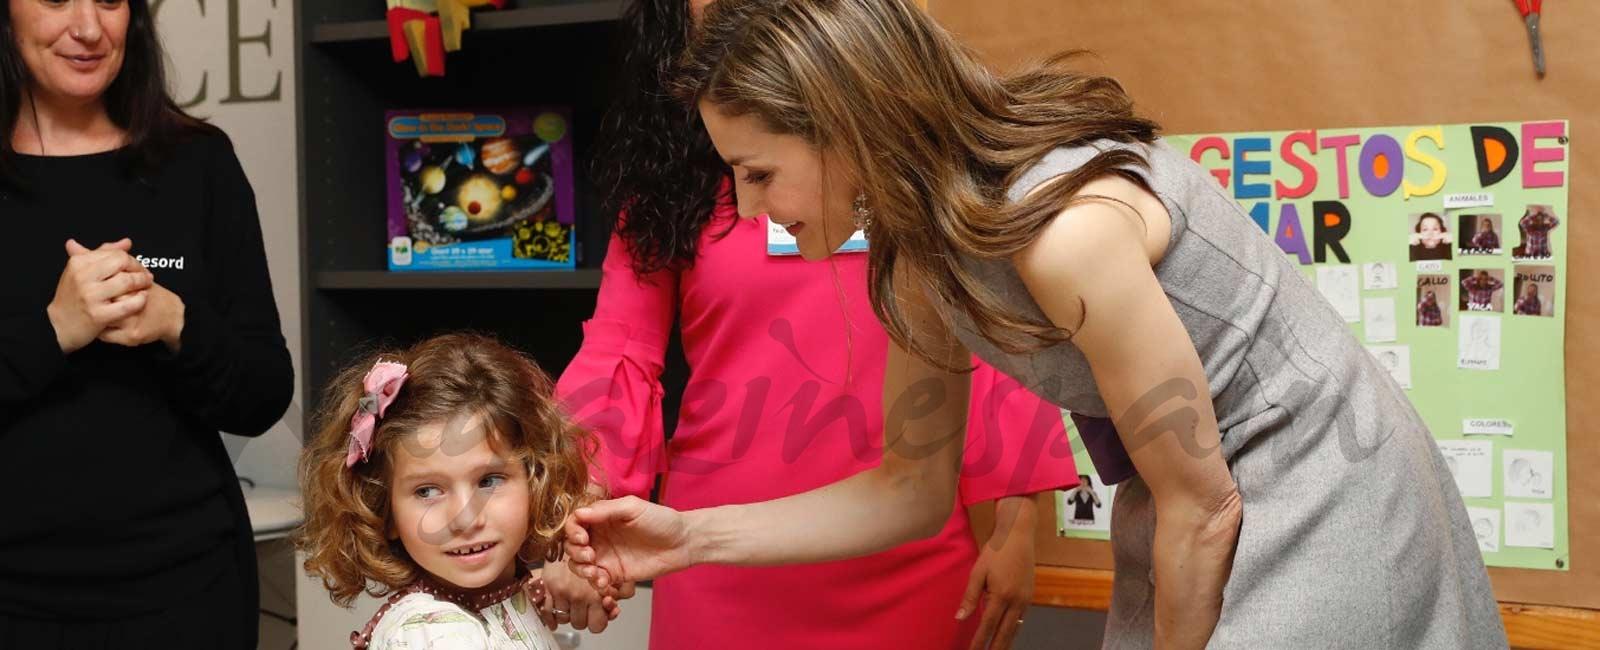 La reina Letizia elige de nuevo a Carolina Herrera